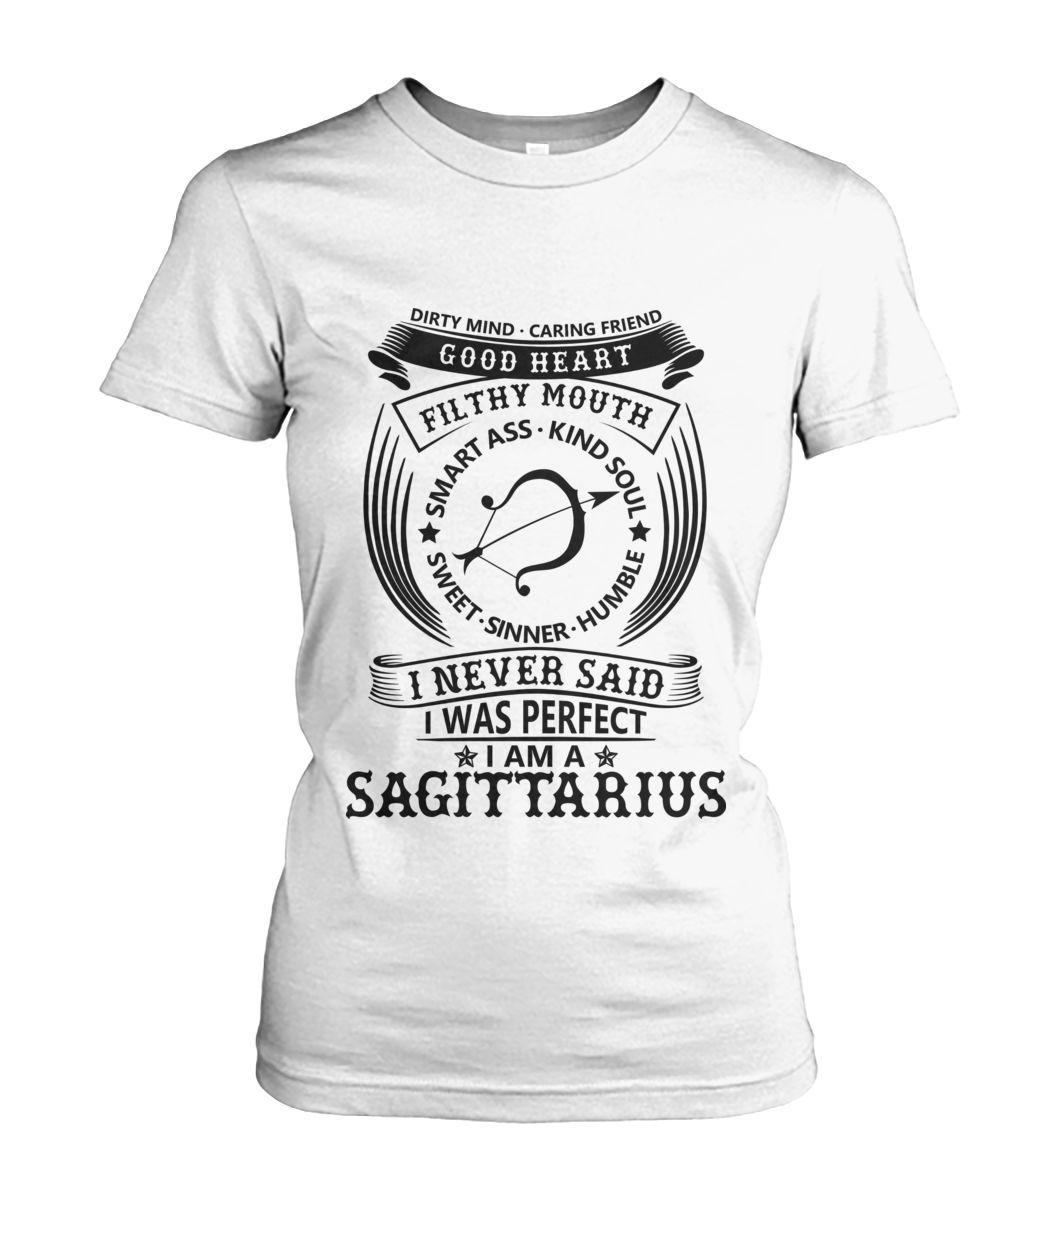 b13023f4 TSHIRT SAGITTARIUS I Never Said I was Perfect I'm a Sagittarius #ladies  #vollecollection #BGM #menstshirts #sneakermatch #ladiestshirt #blackgirl  #black ...